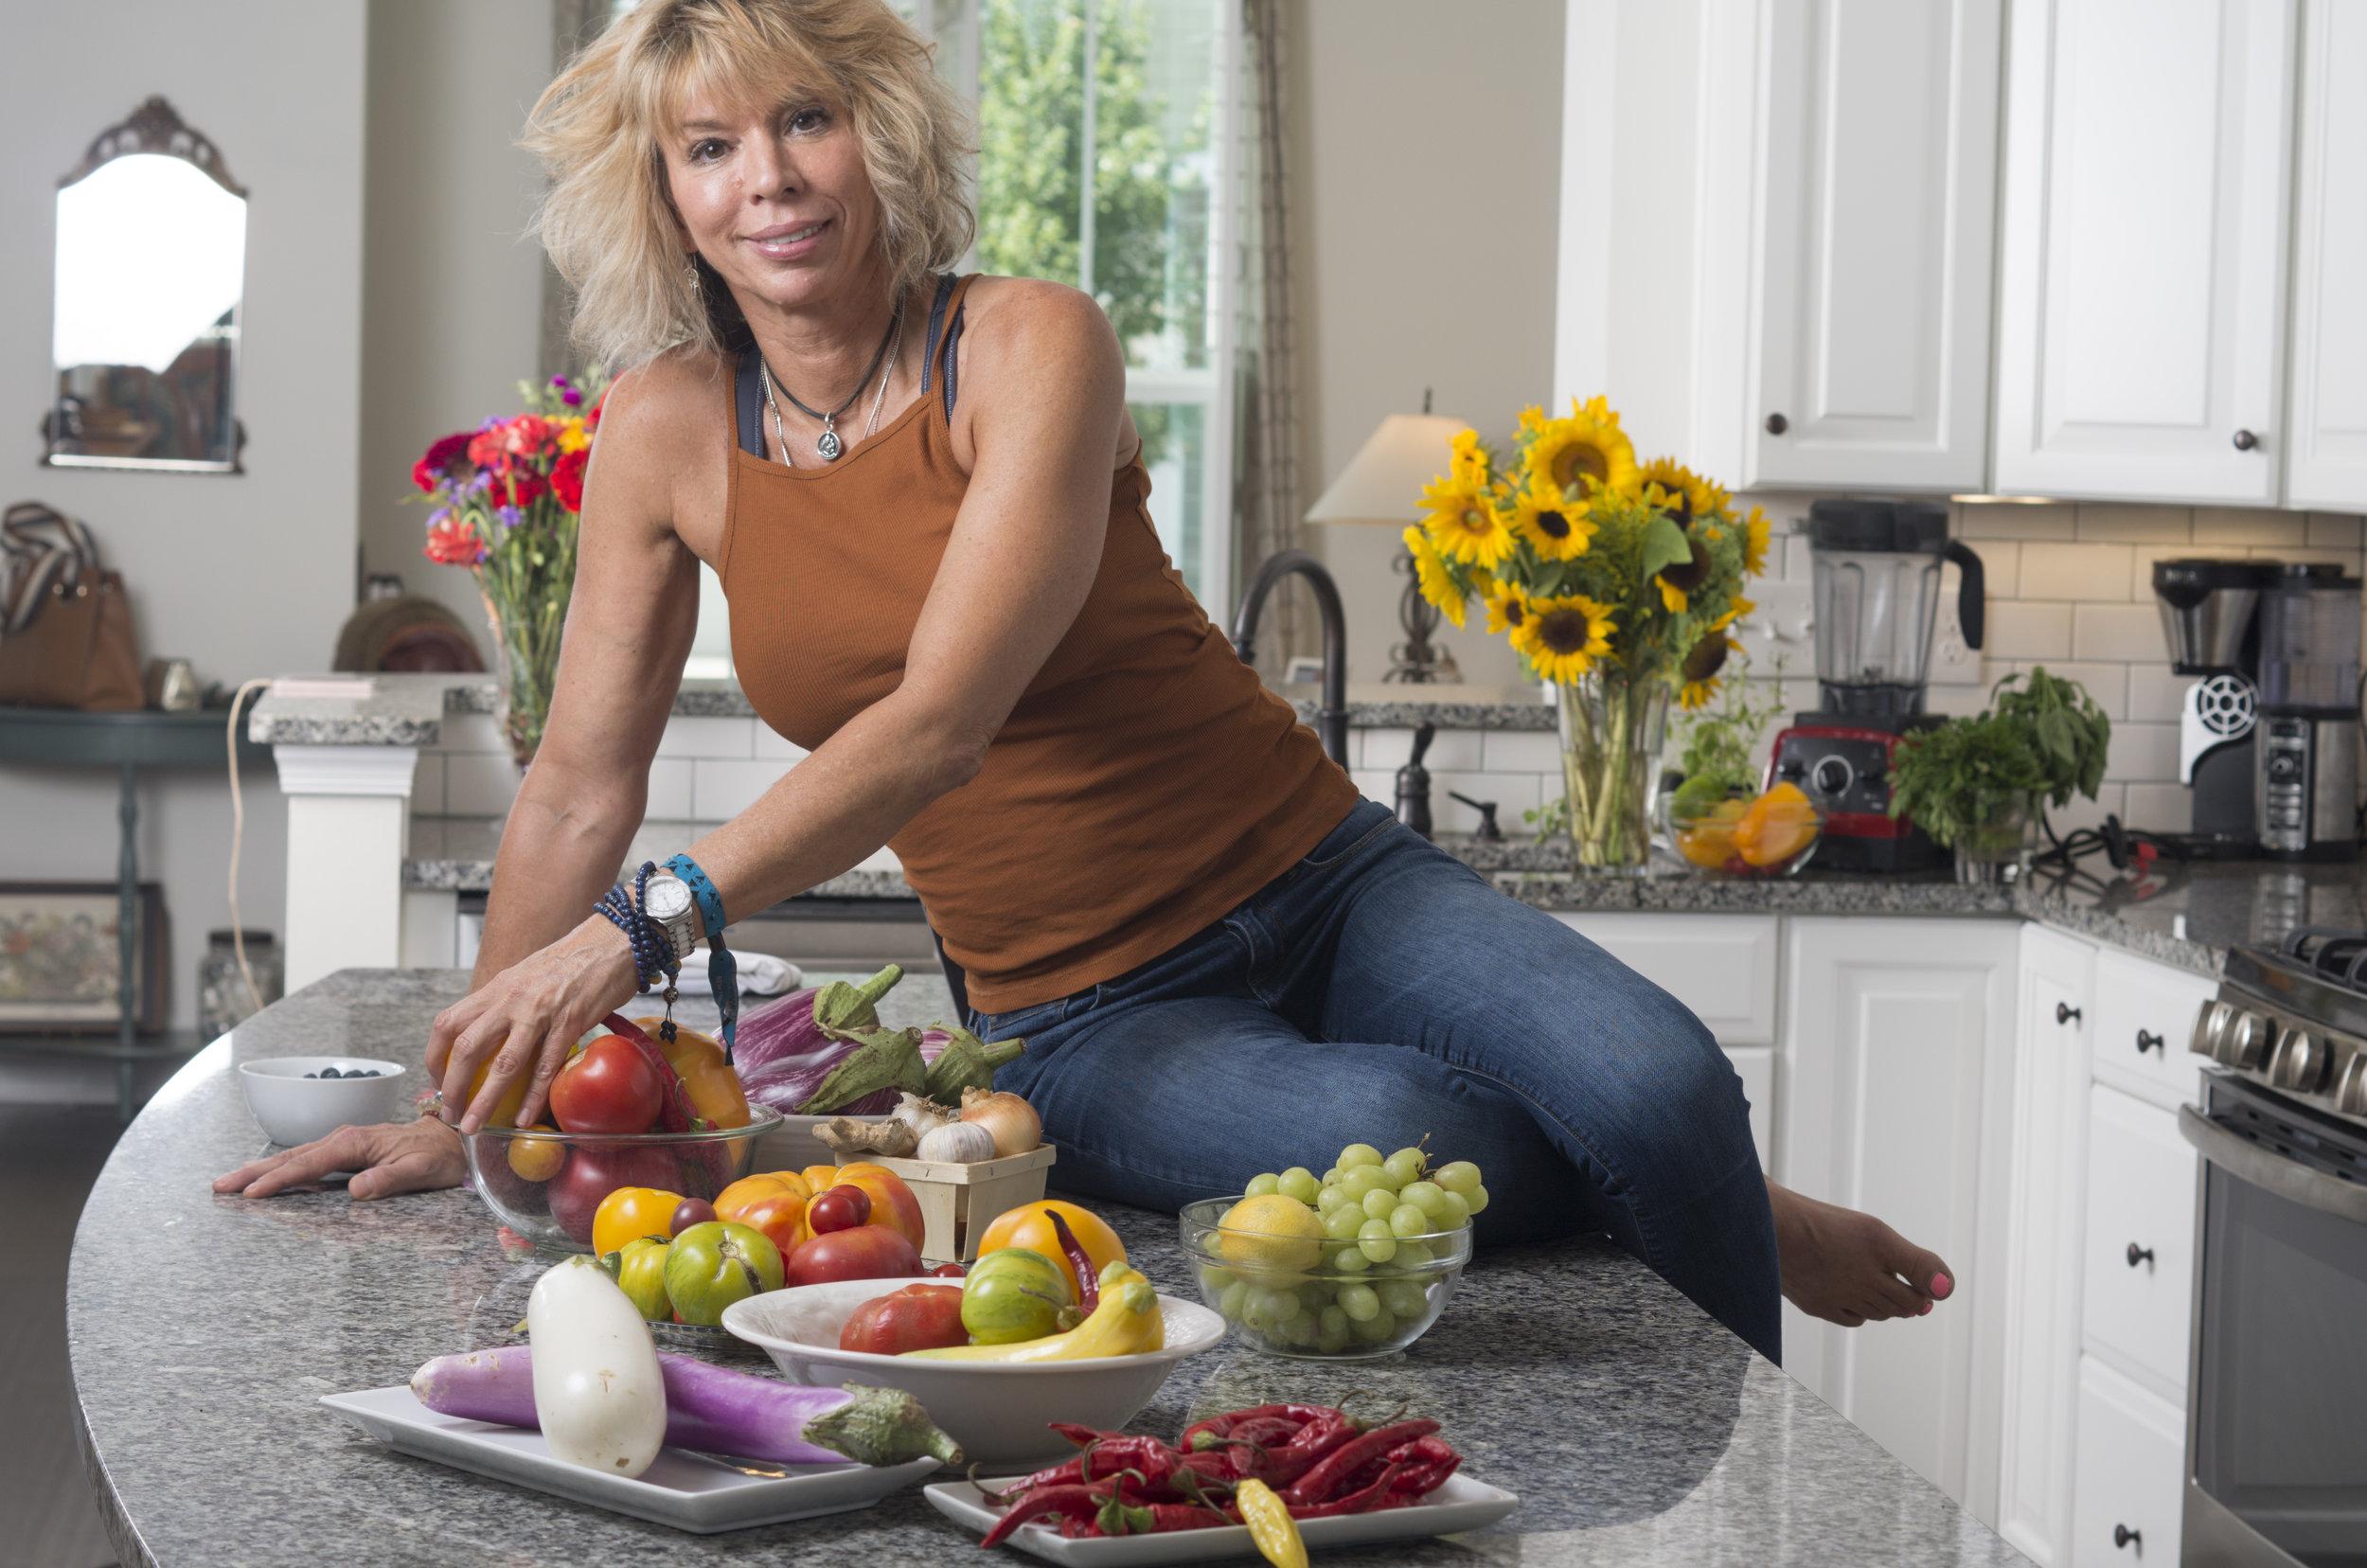 Health + Wellness - Wellness / Body / Attitude / Food